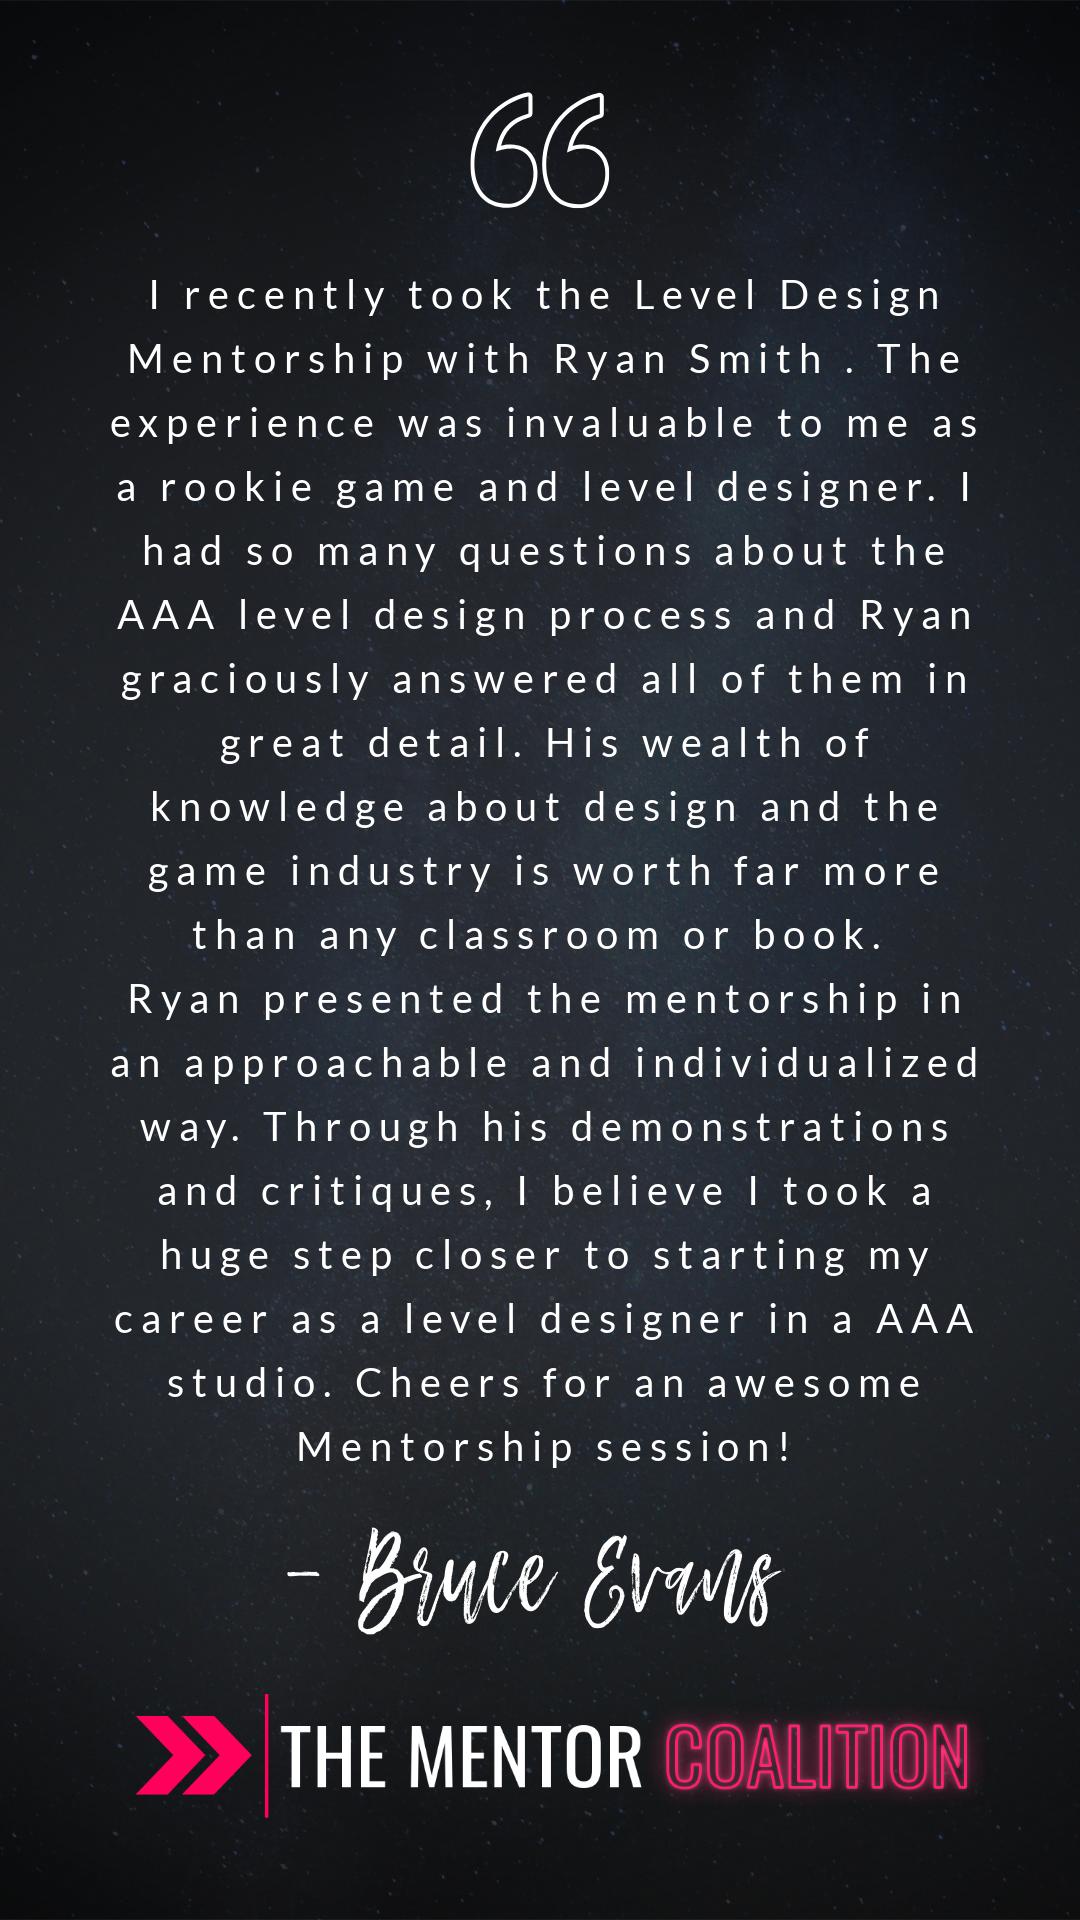 level_design_bruce_evans_testimonial_story.png